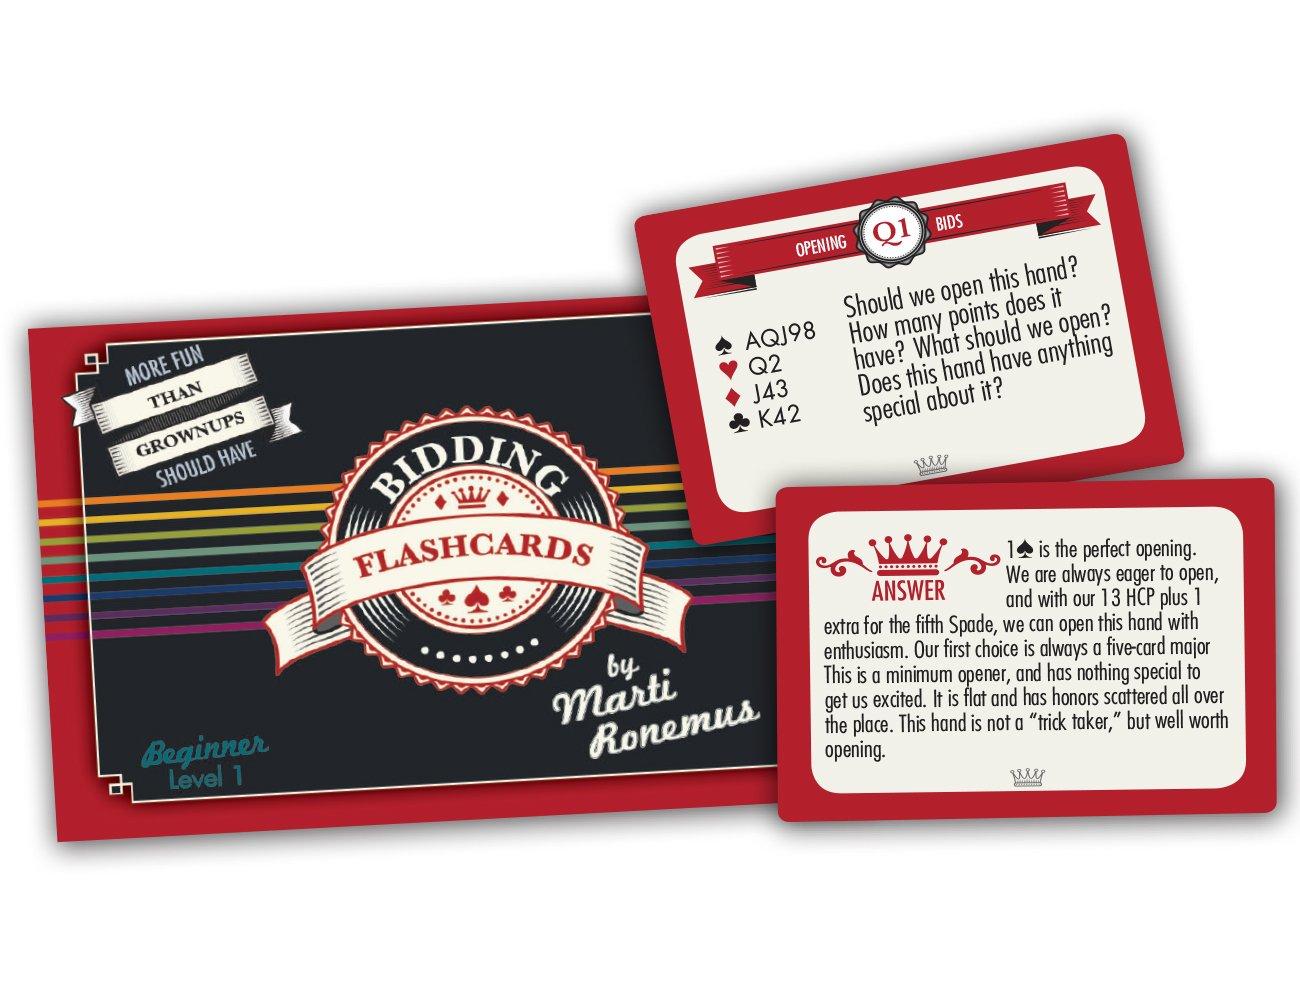 Bridge Bidding Flashcards Level 1 Marti Ronemus - Basic Bidding The Bridge  Player